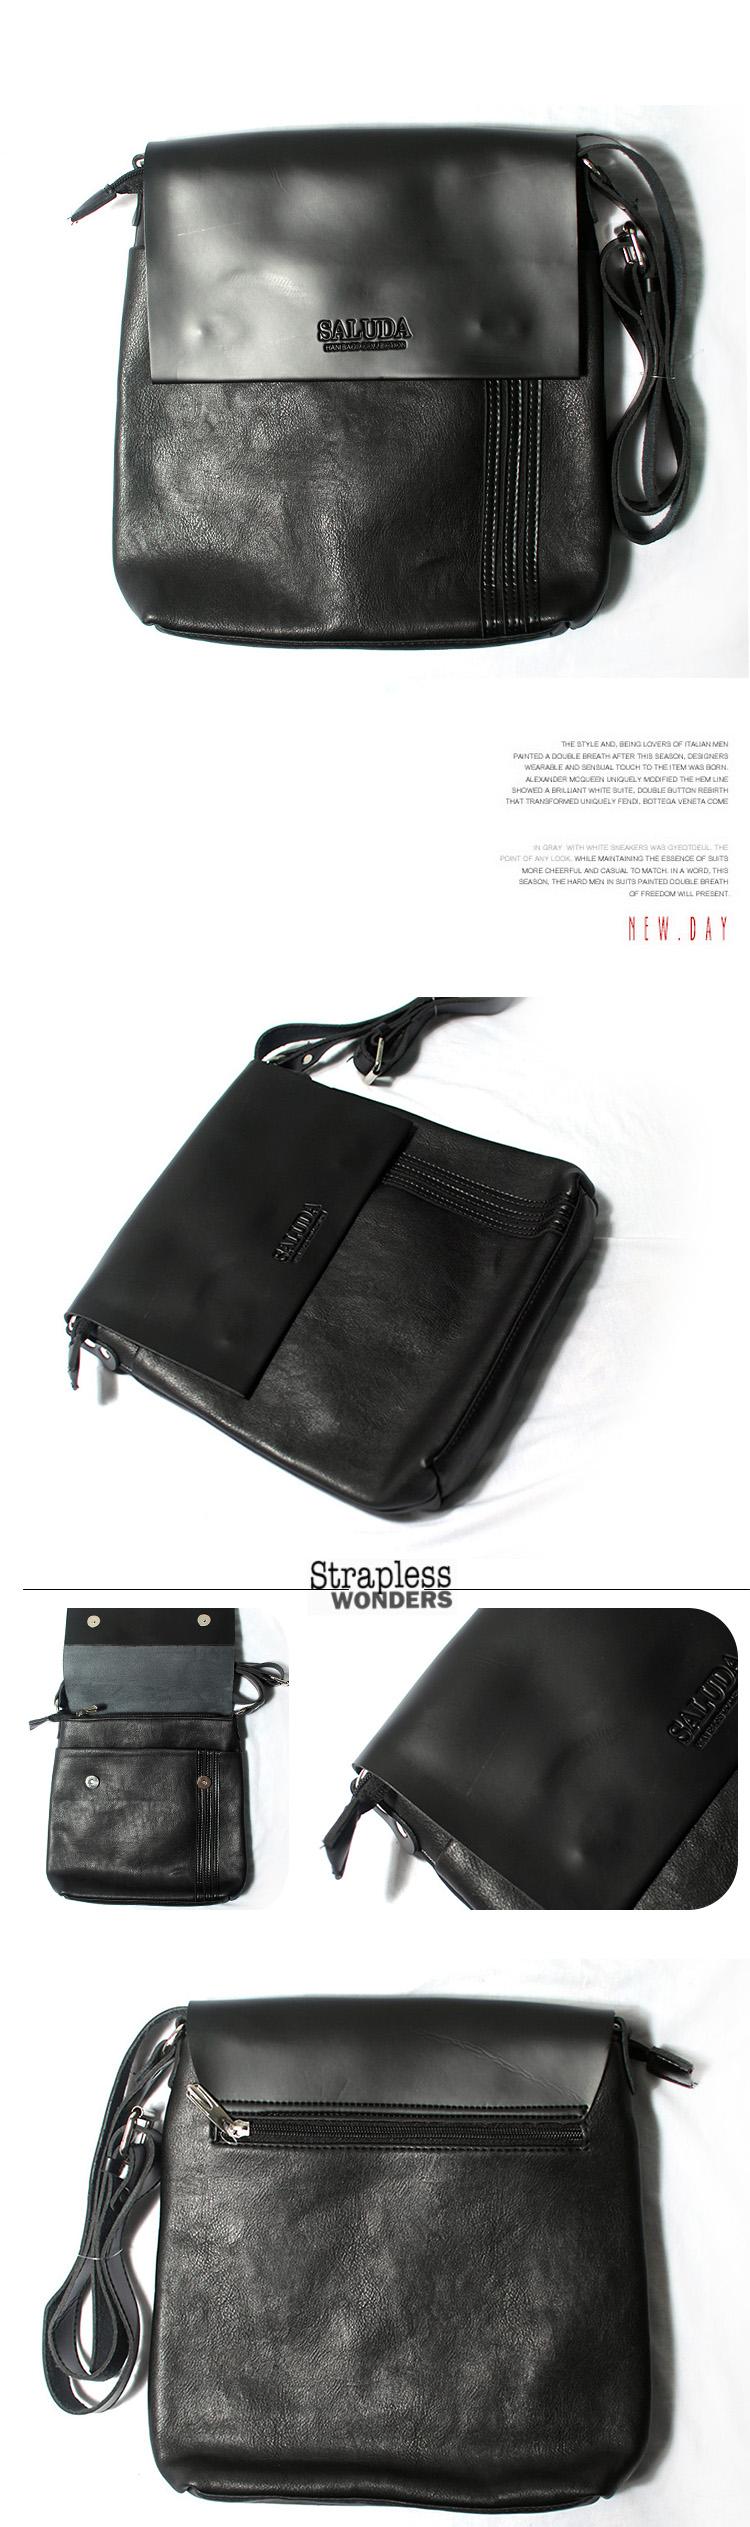 Túi xách ipad da đen txf012 - 1